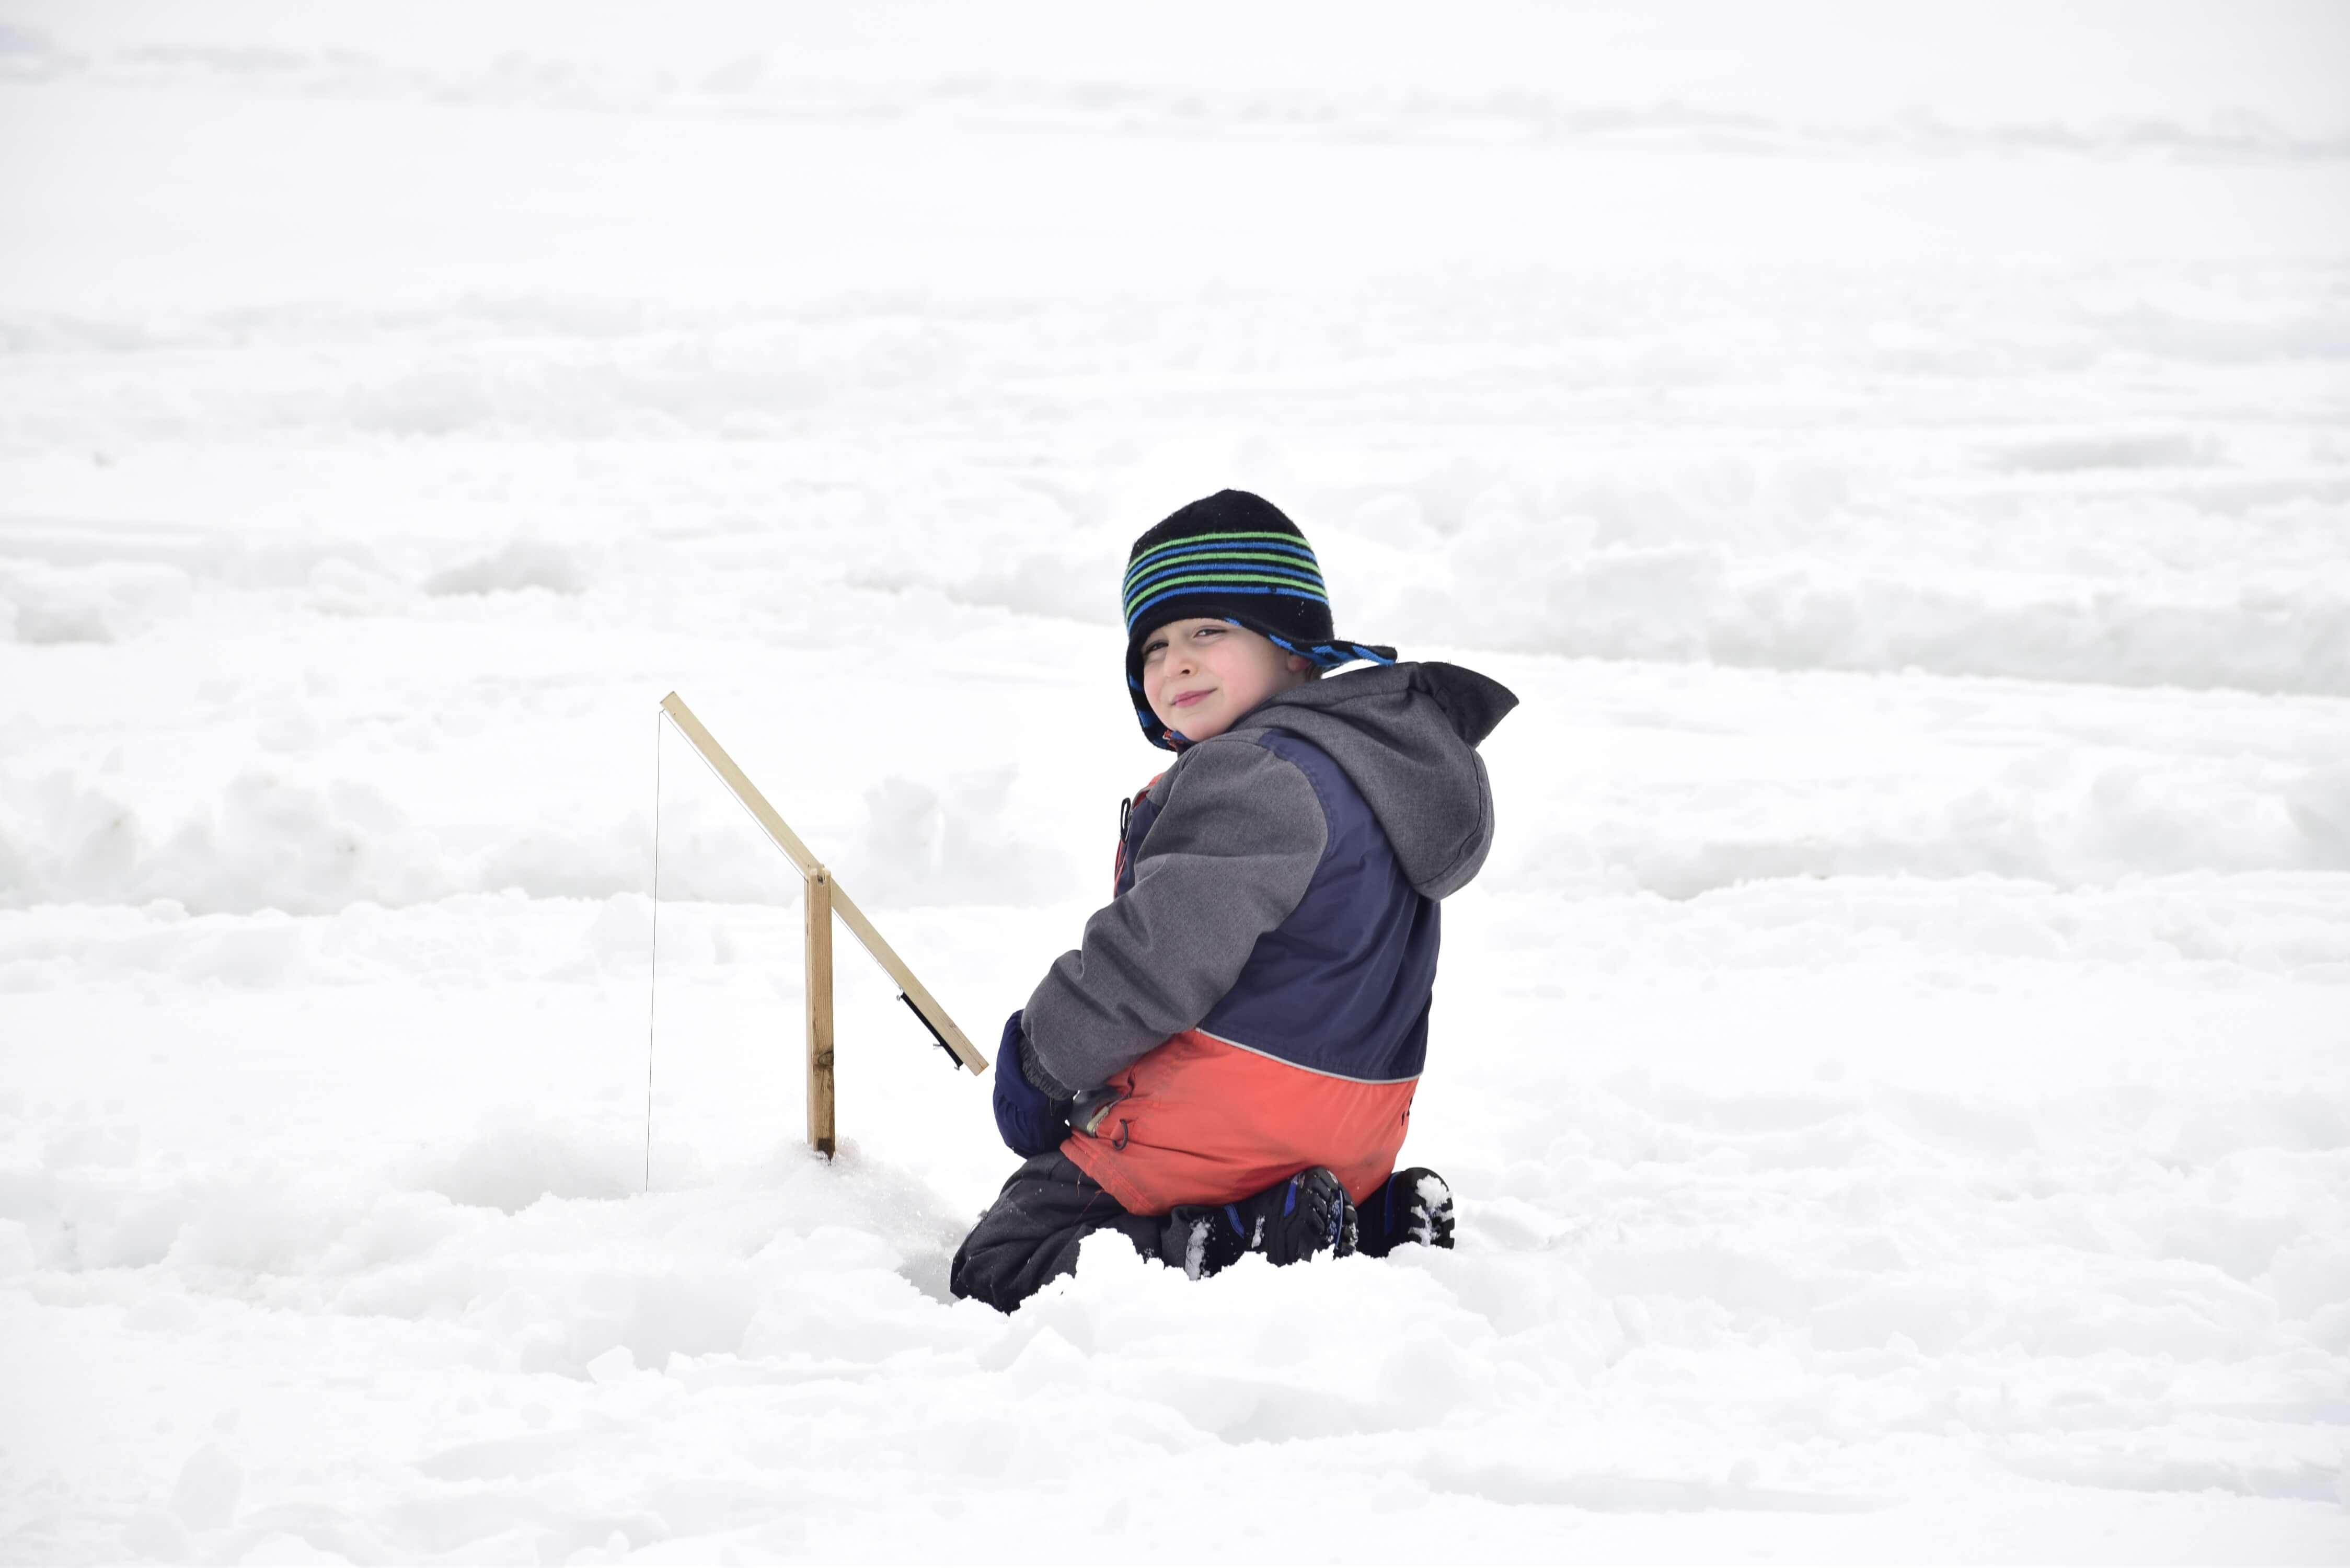 La Fête de la pêche blanche - St-Marcellin - la relève.